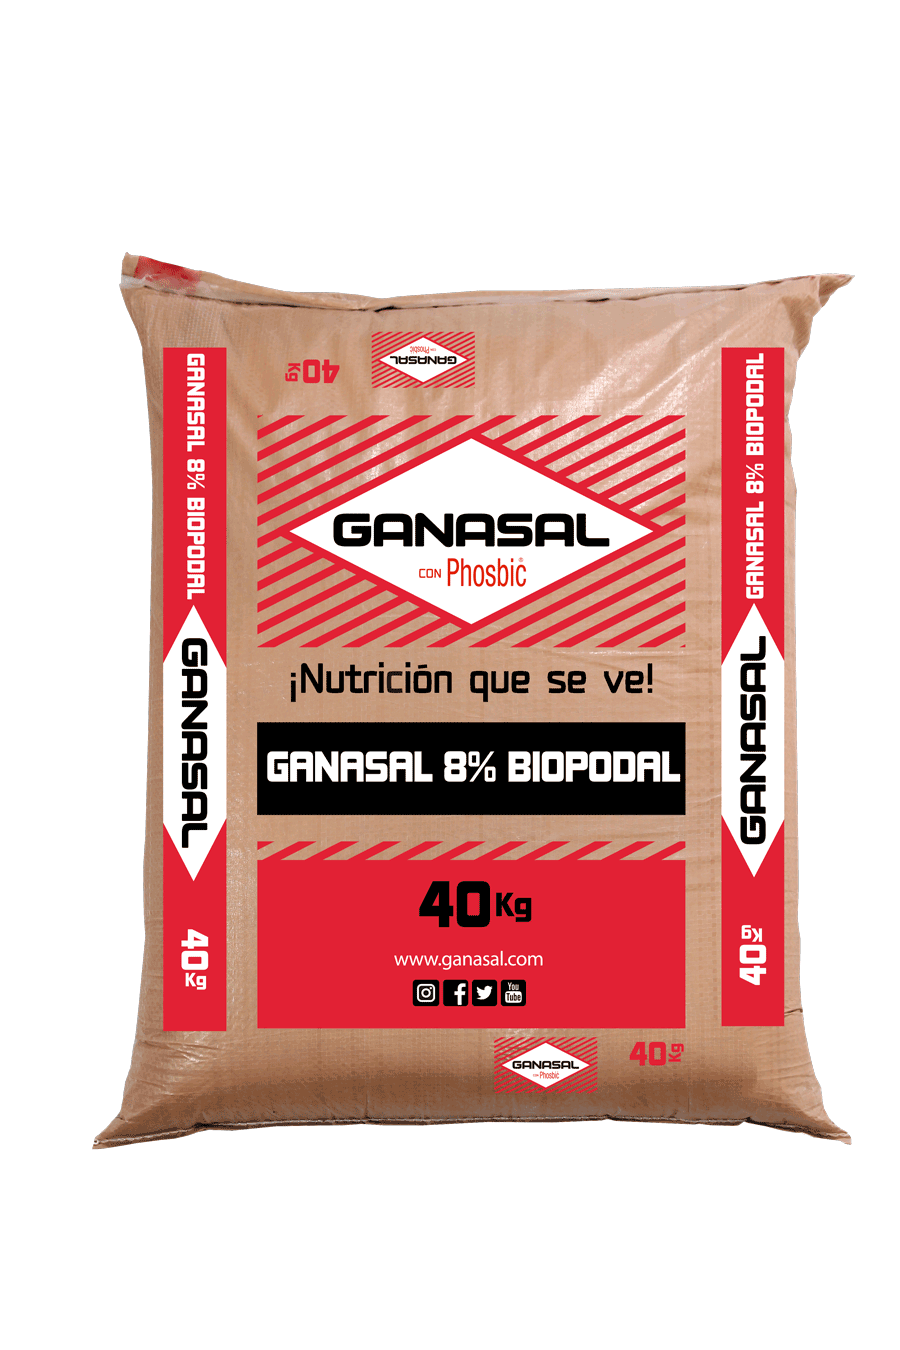 Ganasal 8% Biopodal